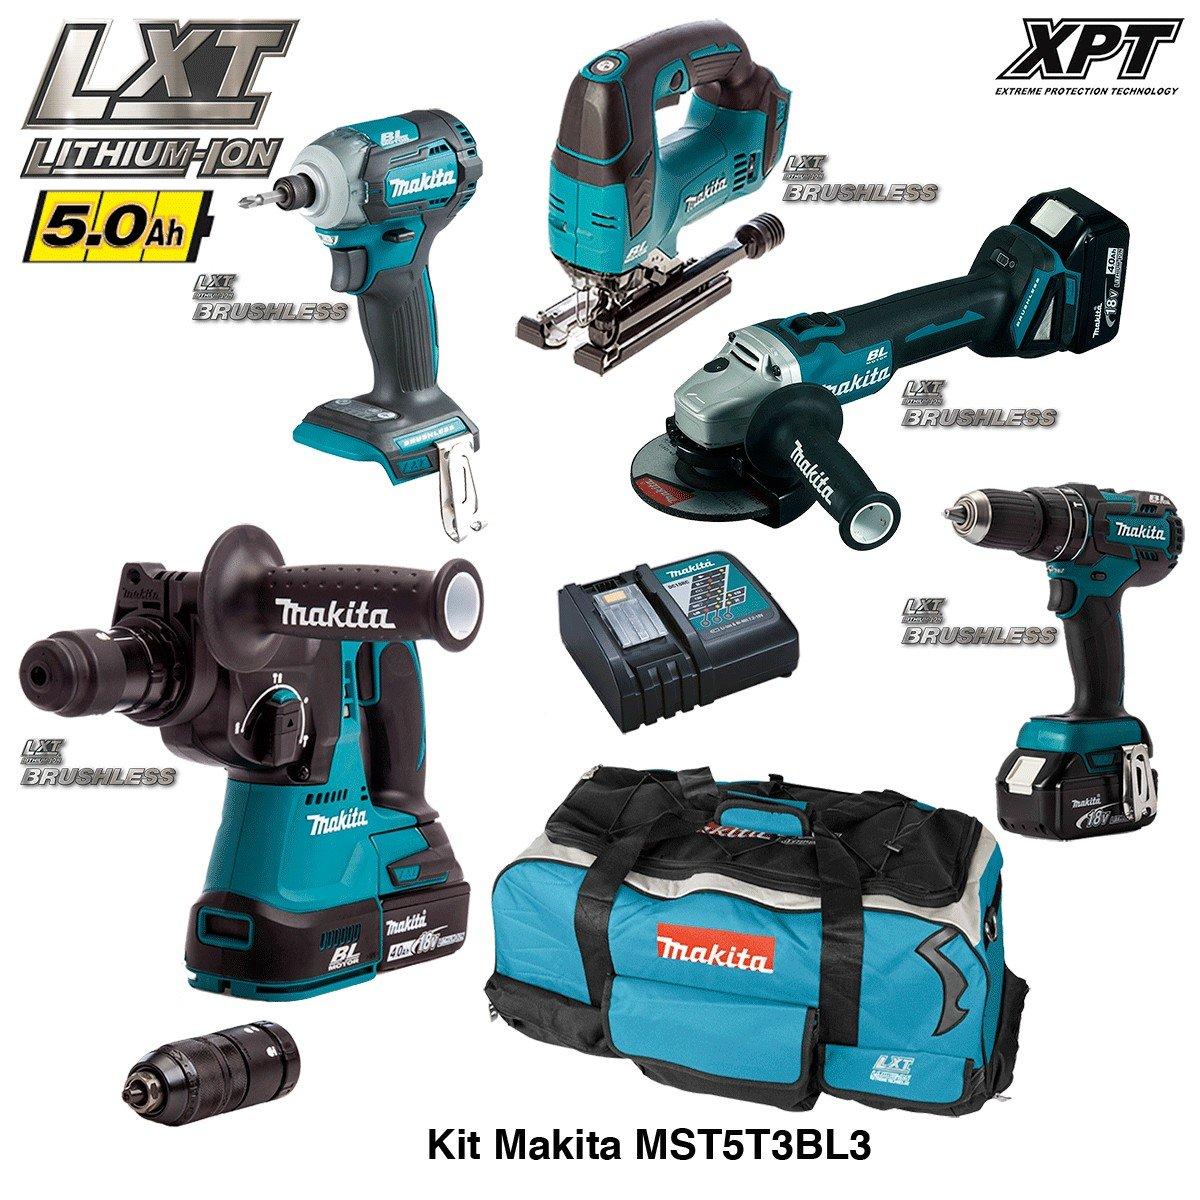 DHR243 + DTD148 + DGA504 + DHP480 + DJV182 + 3 x 5,0 Ah + DC18RC + Trolley Brushless MAKITA Kit MST5T3BL3 18V